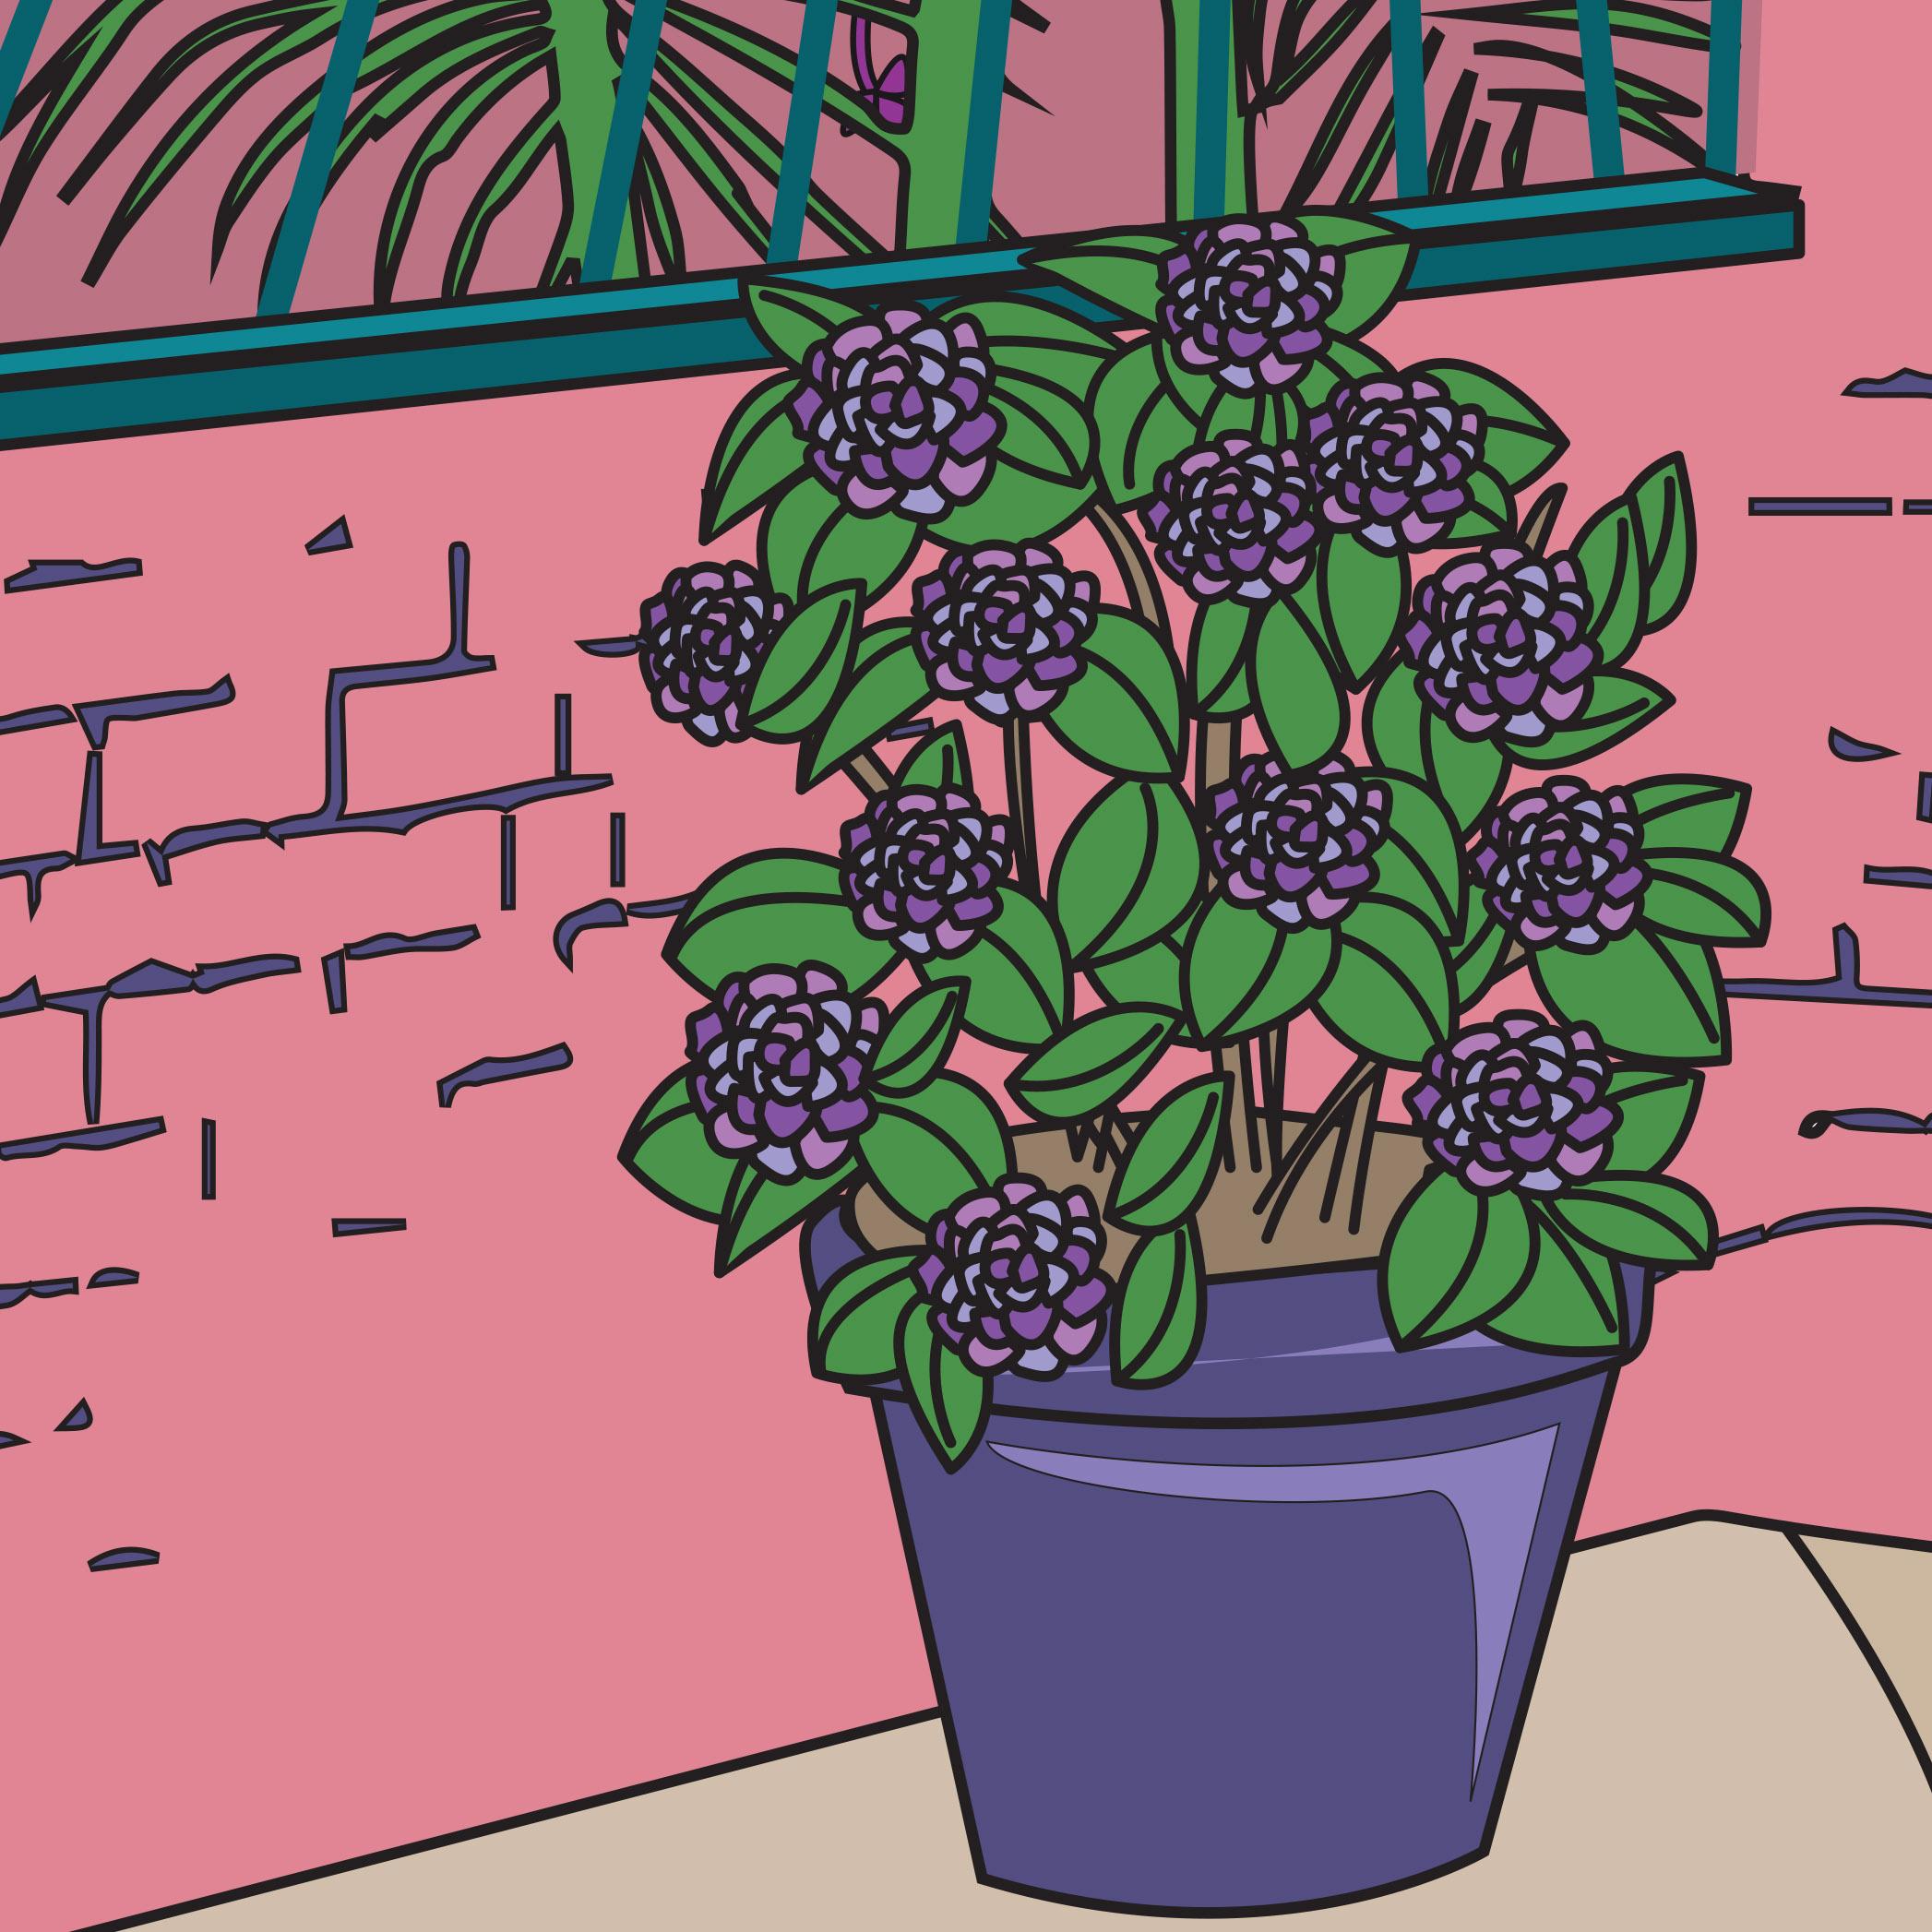 hydrangea-illustration-art-commisssion